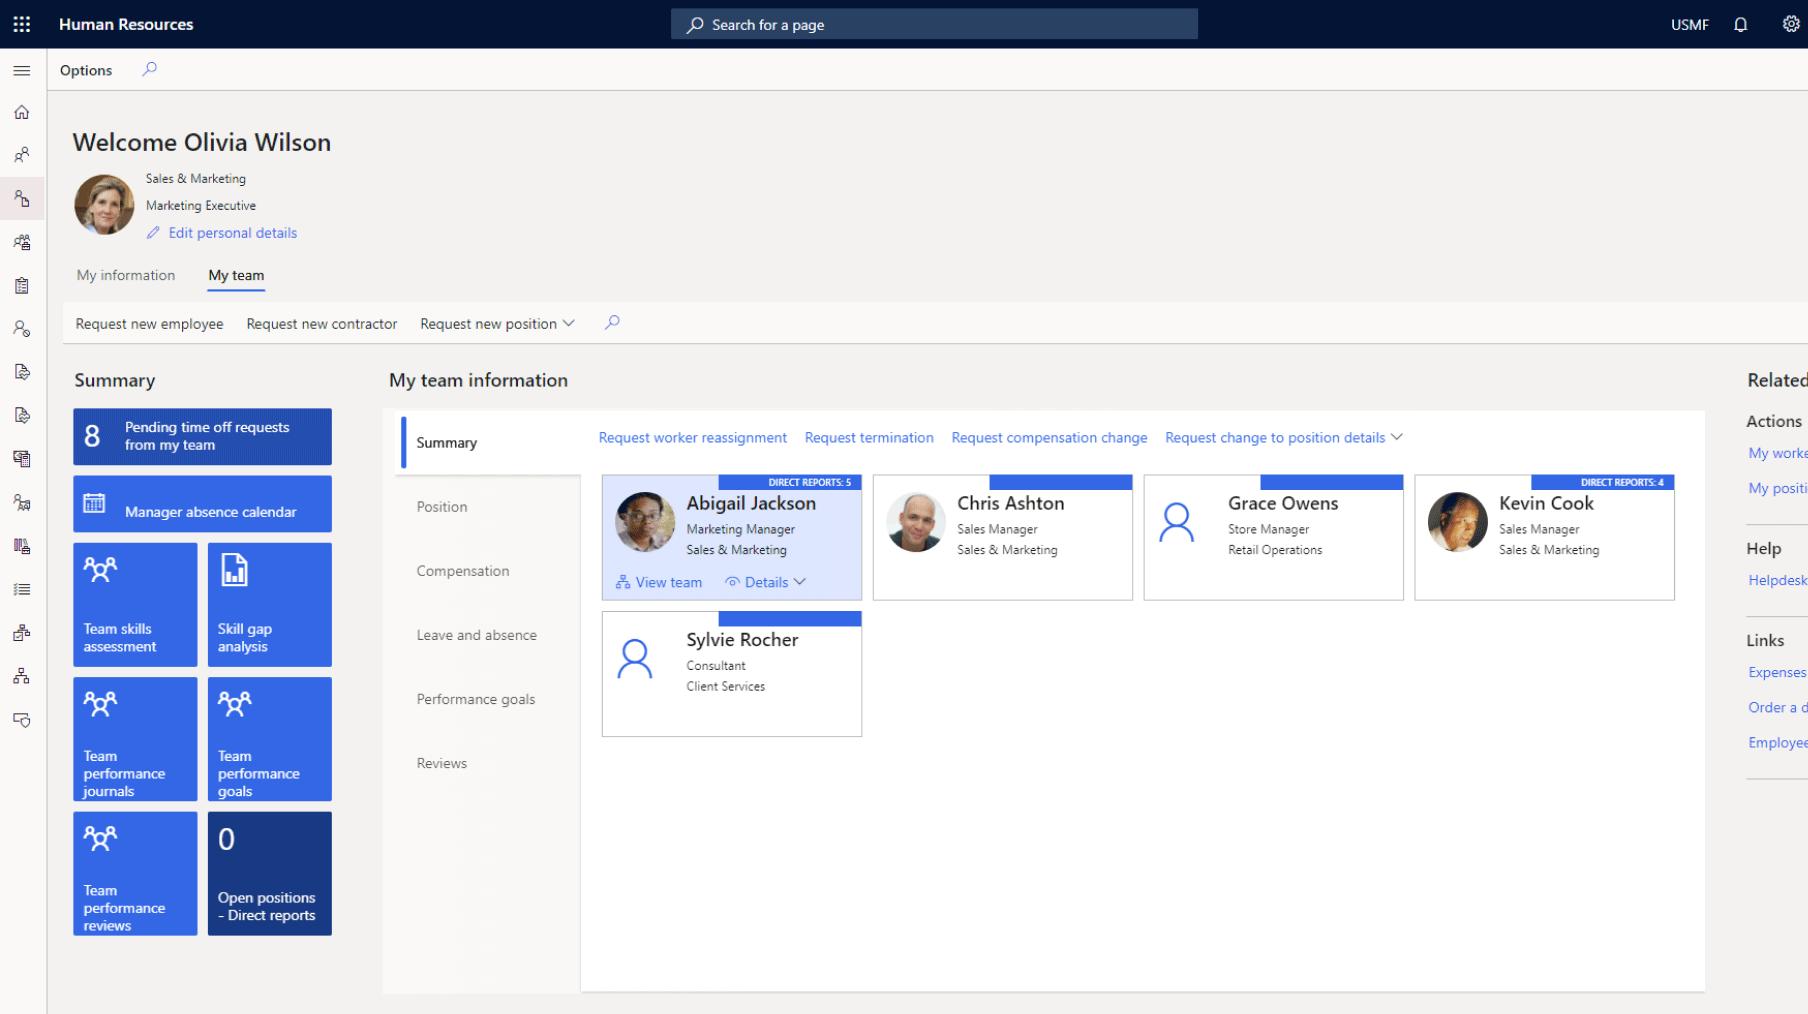 Microsoft Dynamics 365 Human Resources features: LinkedIn Integration